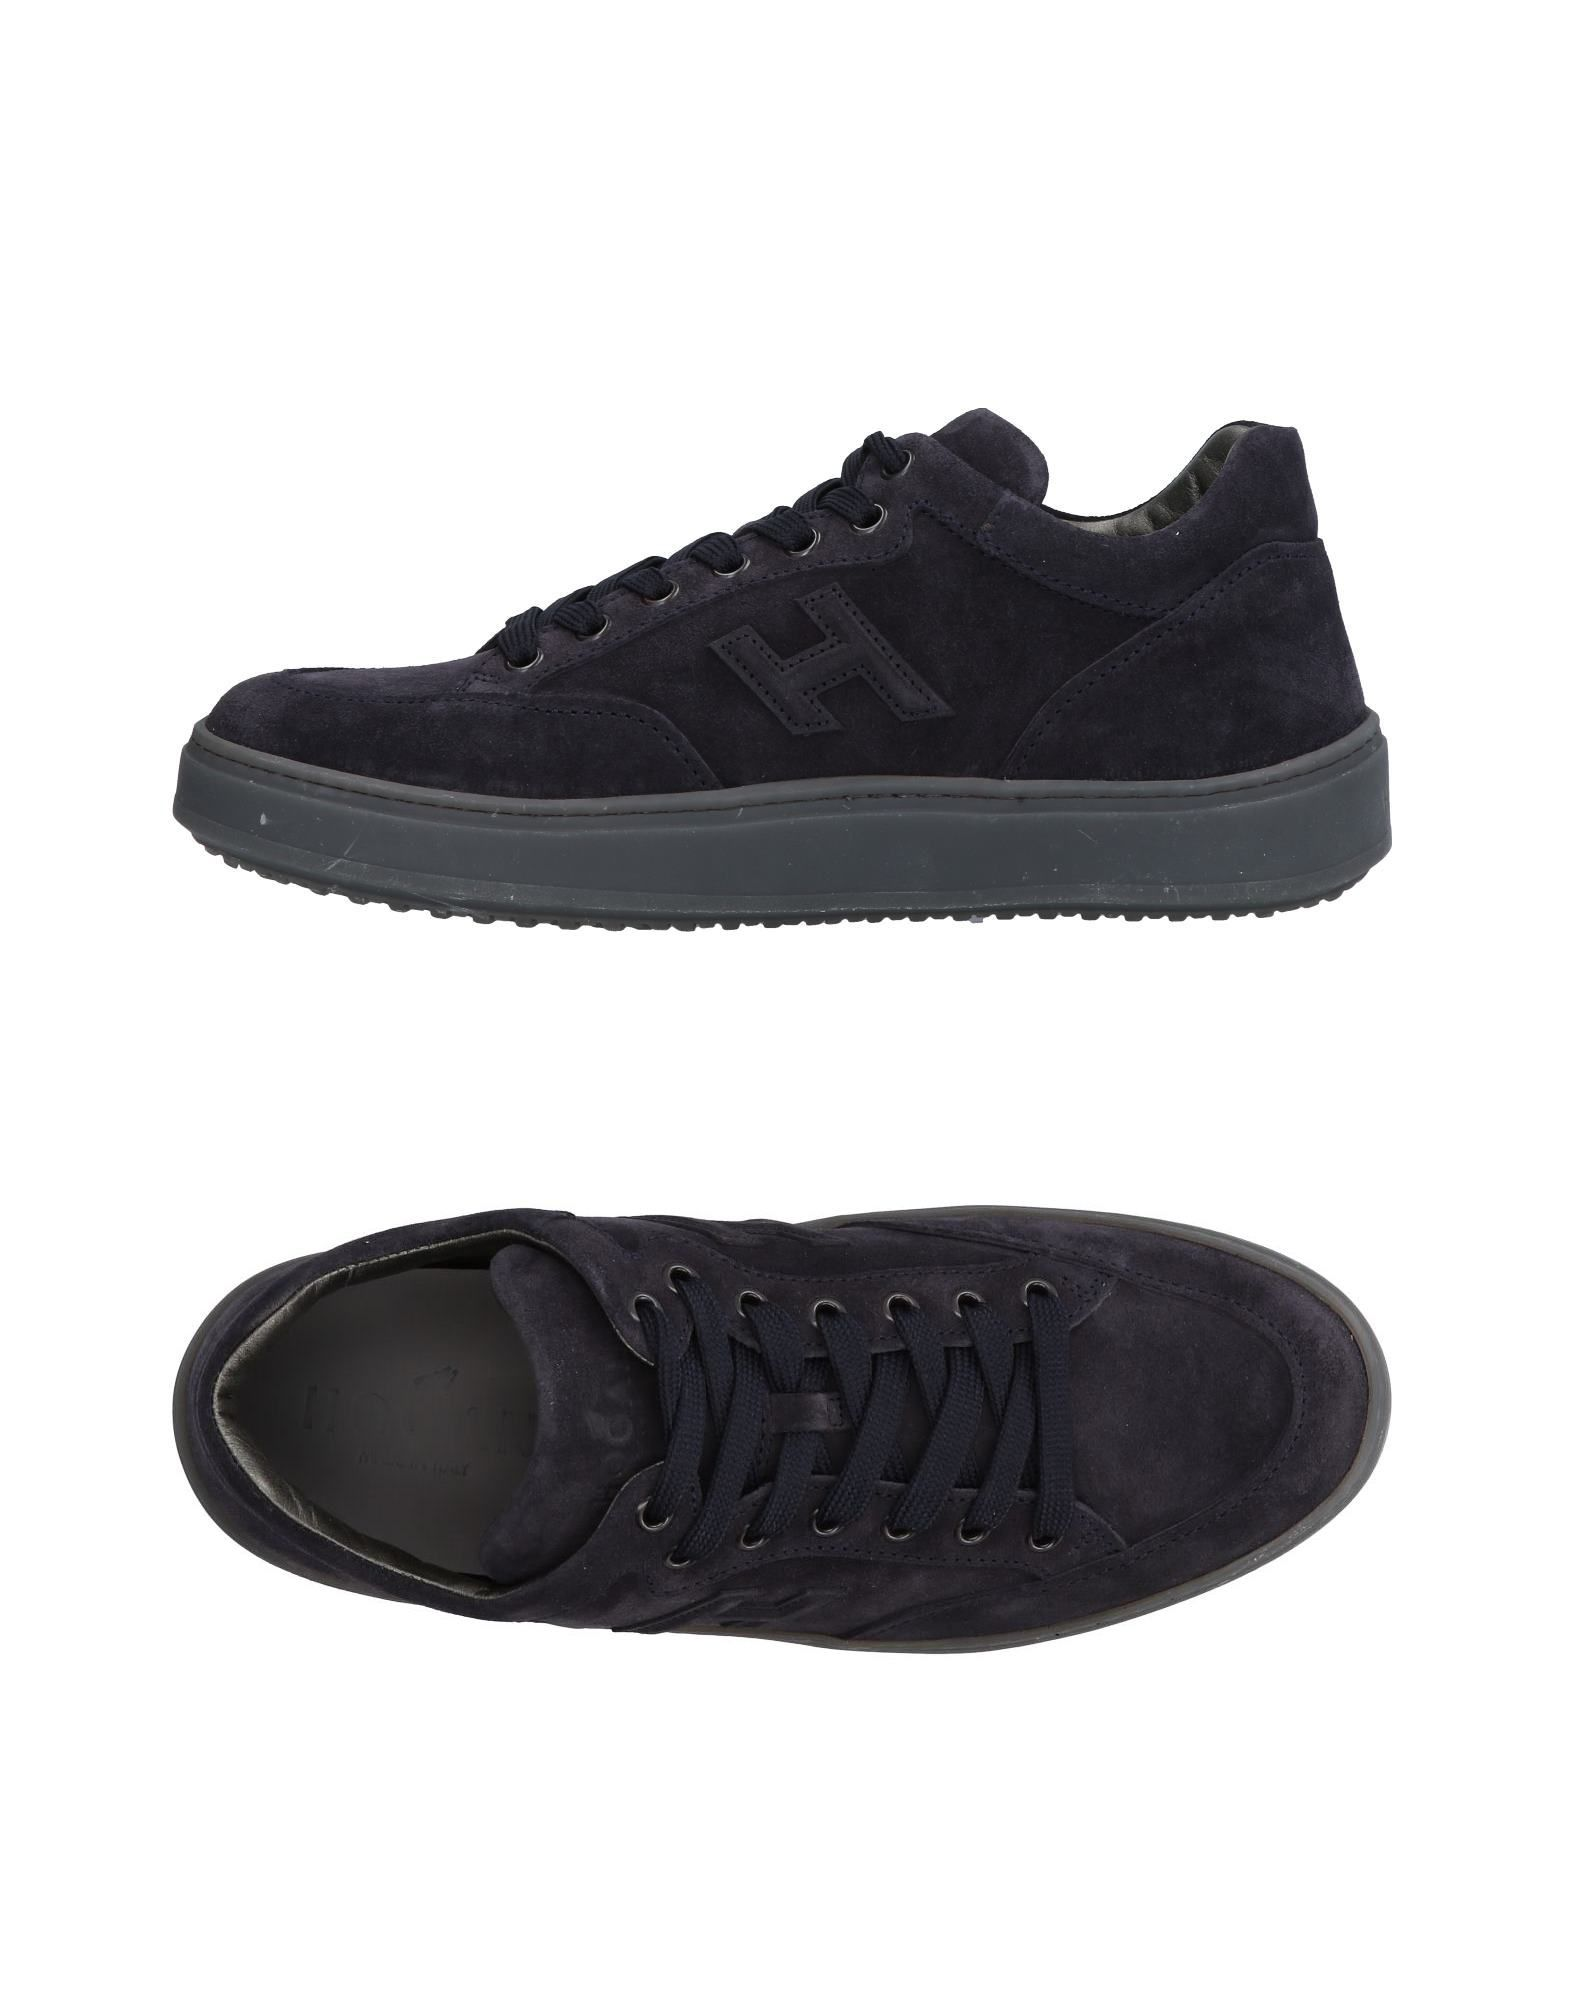 Hogan Sneakers Herren  11484428HX Gute Qualität beliebte Schuhe